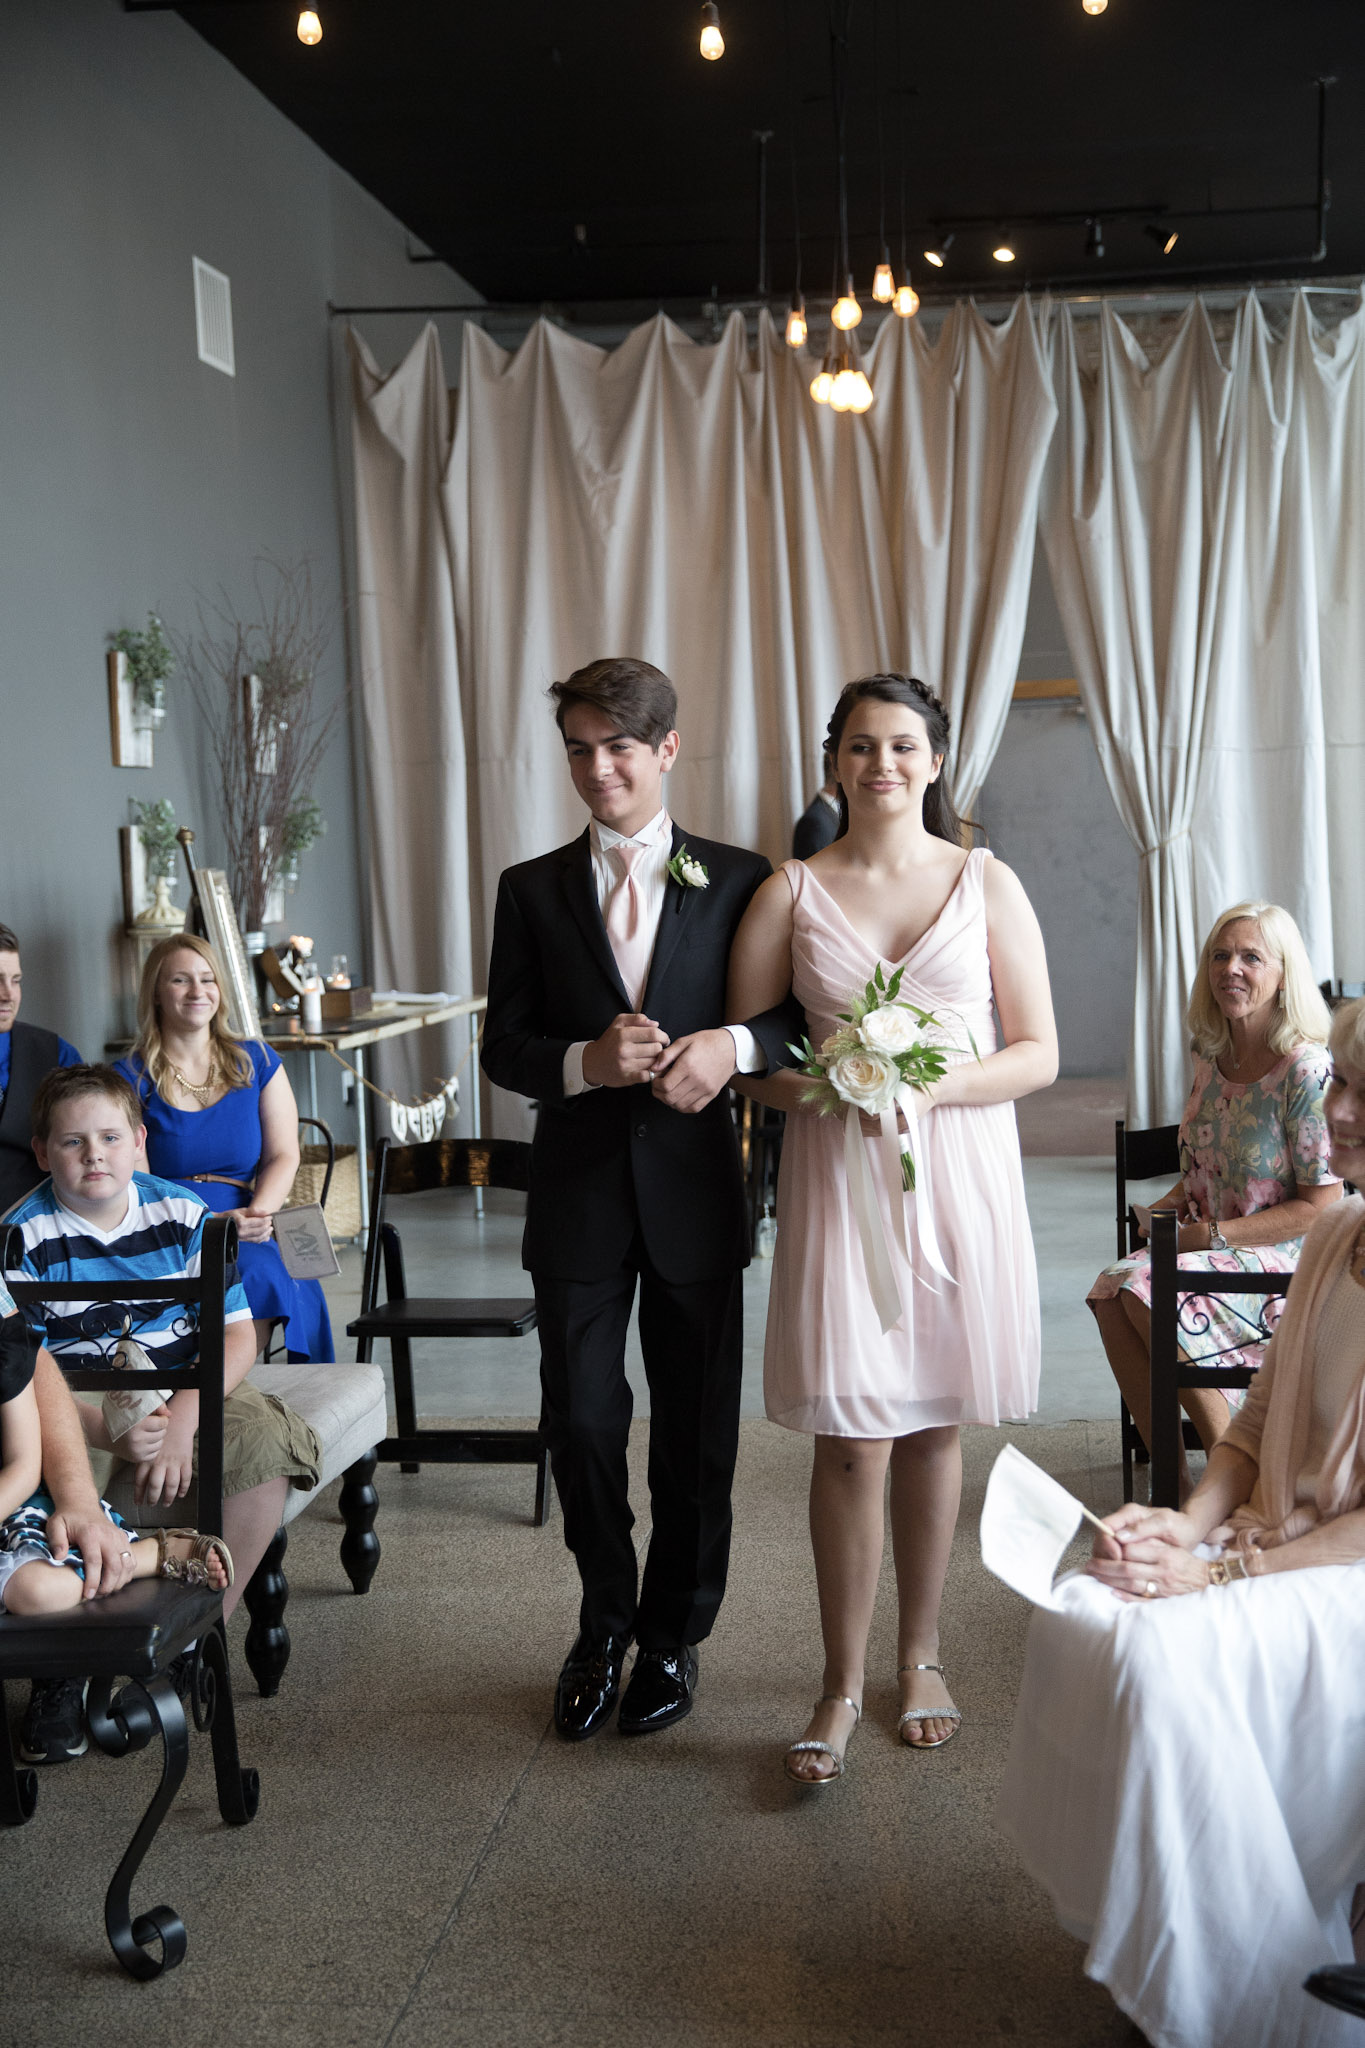 The_Vow_Exchange_Kansas_City_Small_Budget_Wedding_Venue_Kiersten&Brice_IMG-13.jpg